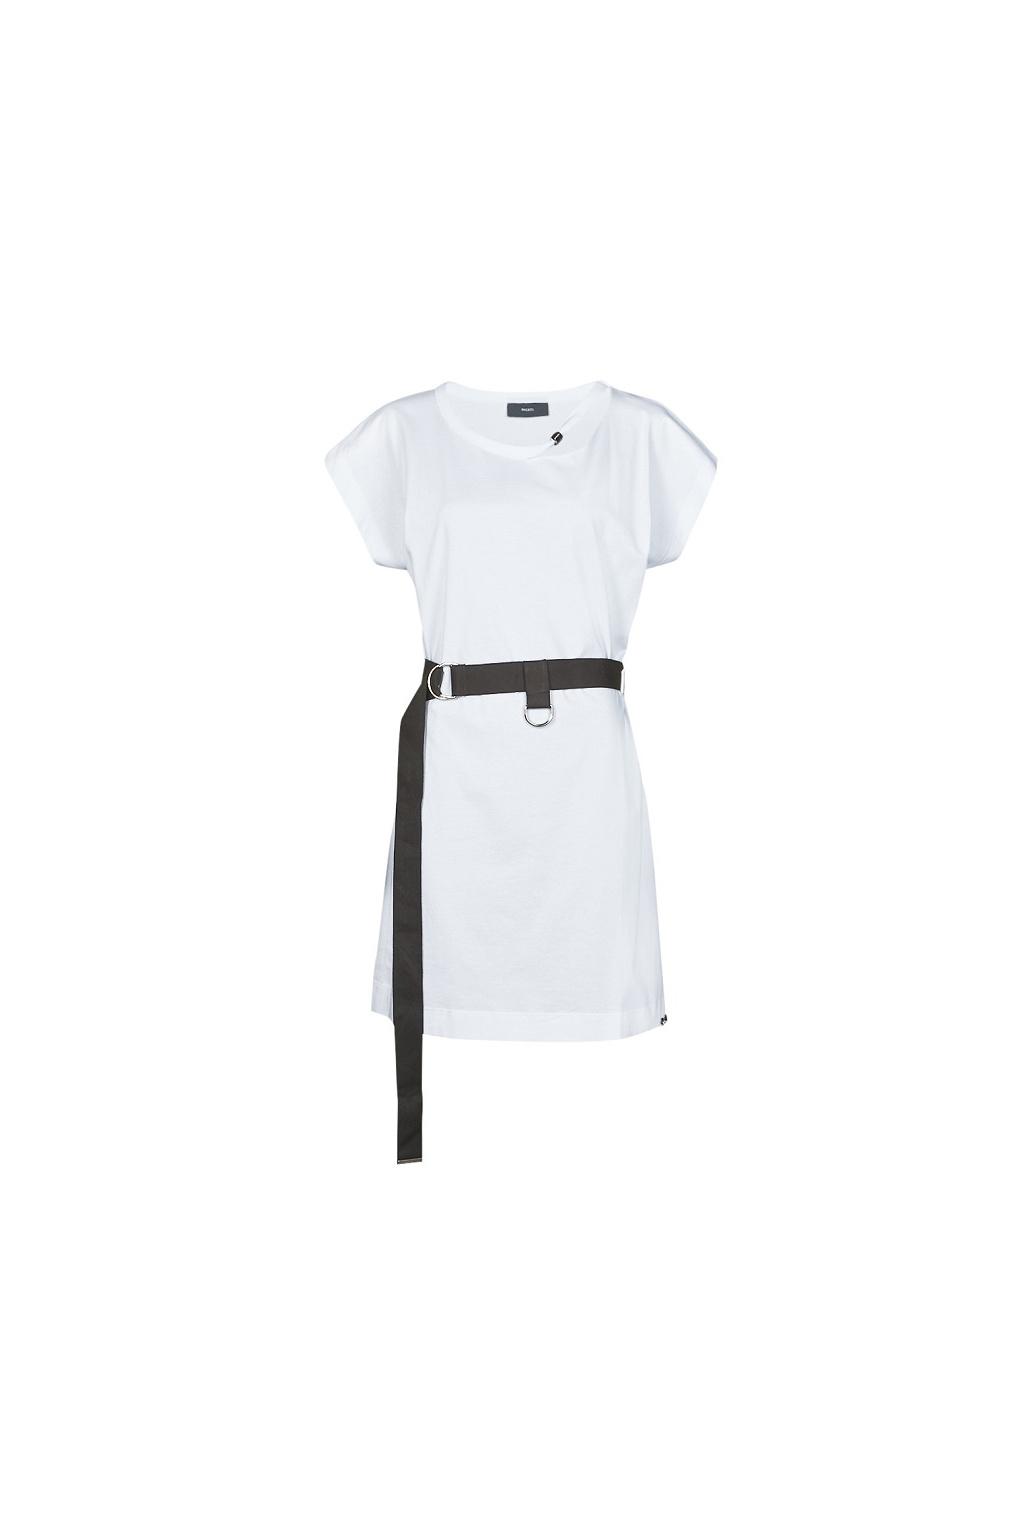 Dámské šaty Diesel D Easy bílé